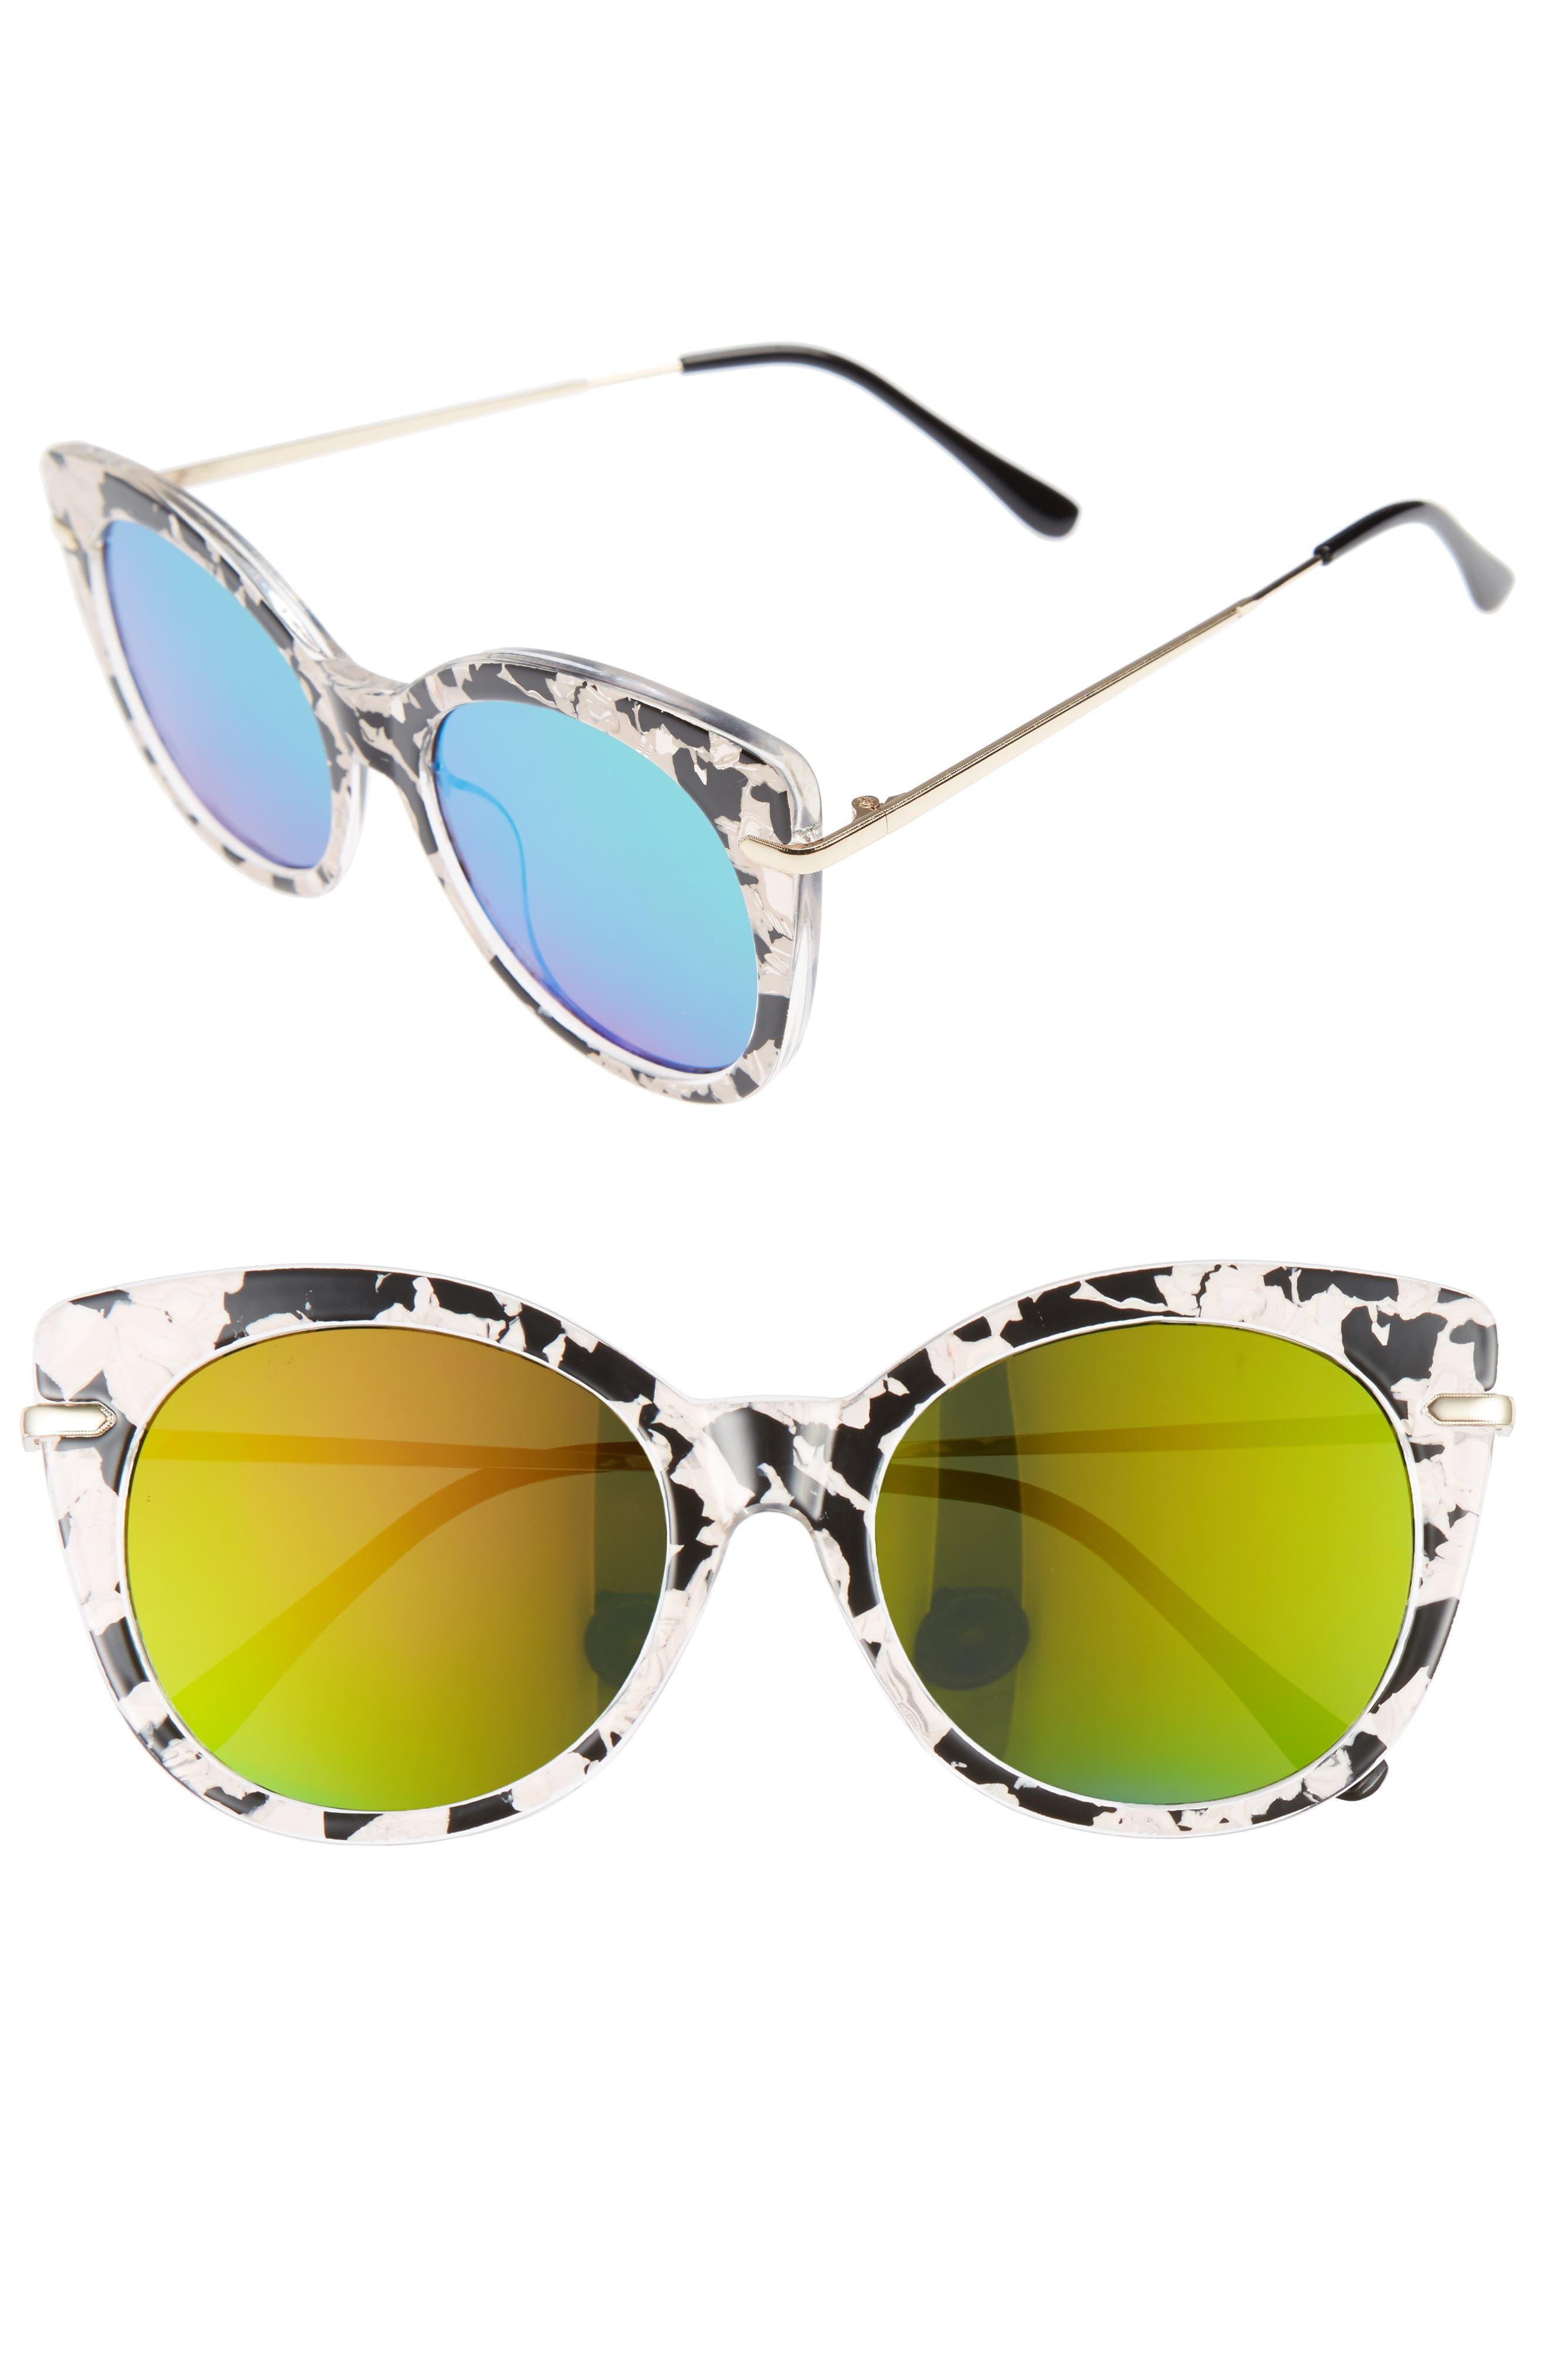 Alternate Image 1 Selected - BP. Kitty 52mm Mirrored Cat Eye Sunglasses